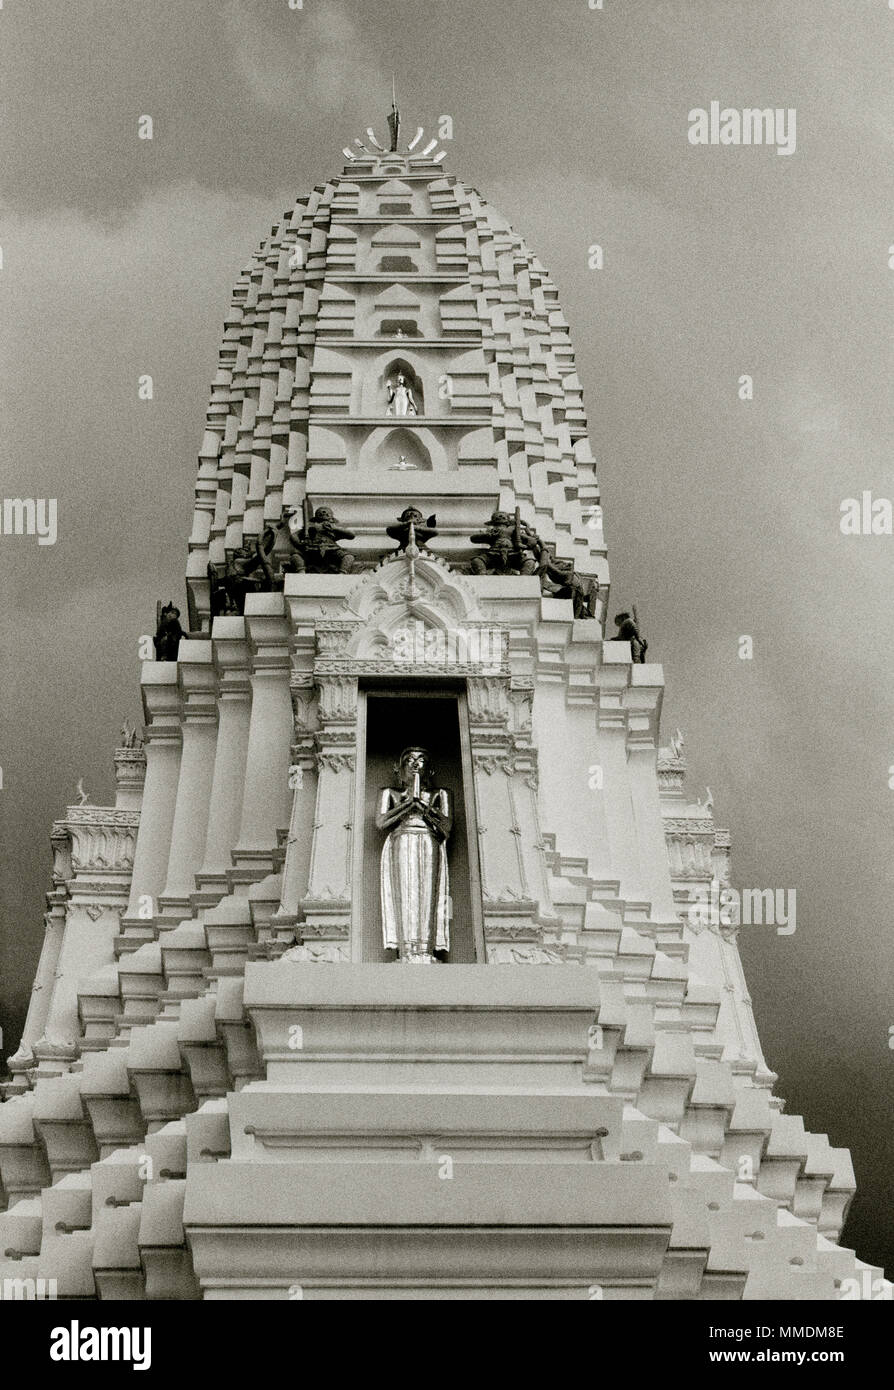 Pagoda at the Buddhist Temple of the Bell - Wat Rakhang Kositaram Woramahavihan in Bangkok in Thailand in Southeast Asia Far East. Buddha Buddhism - Stock Image